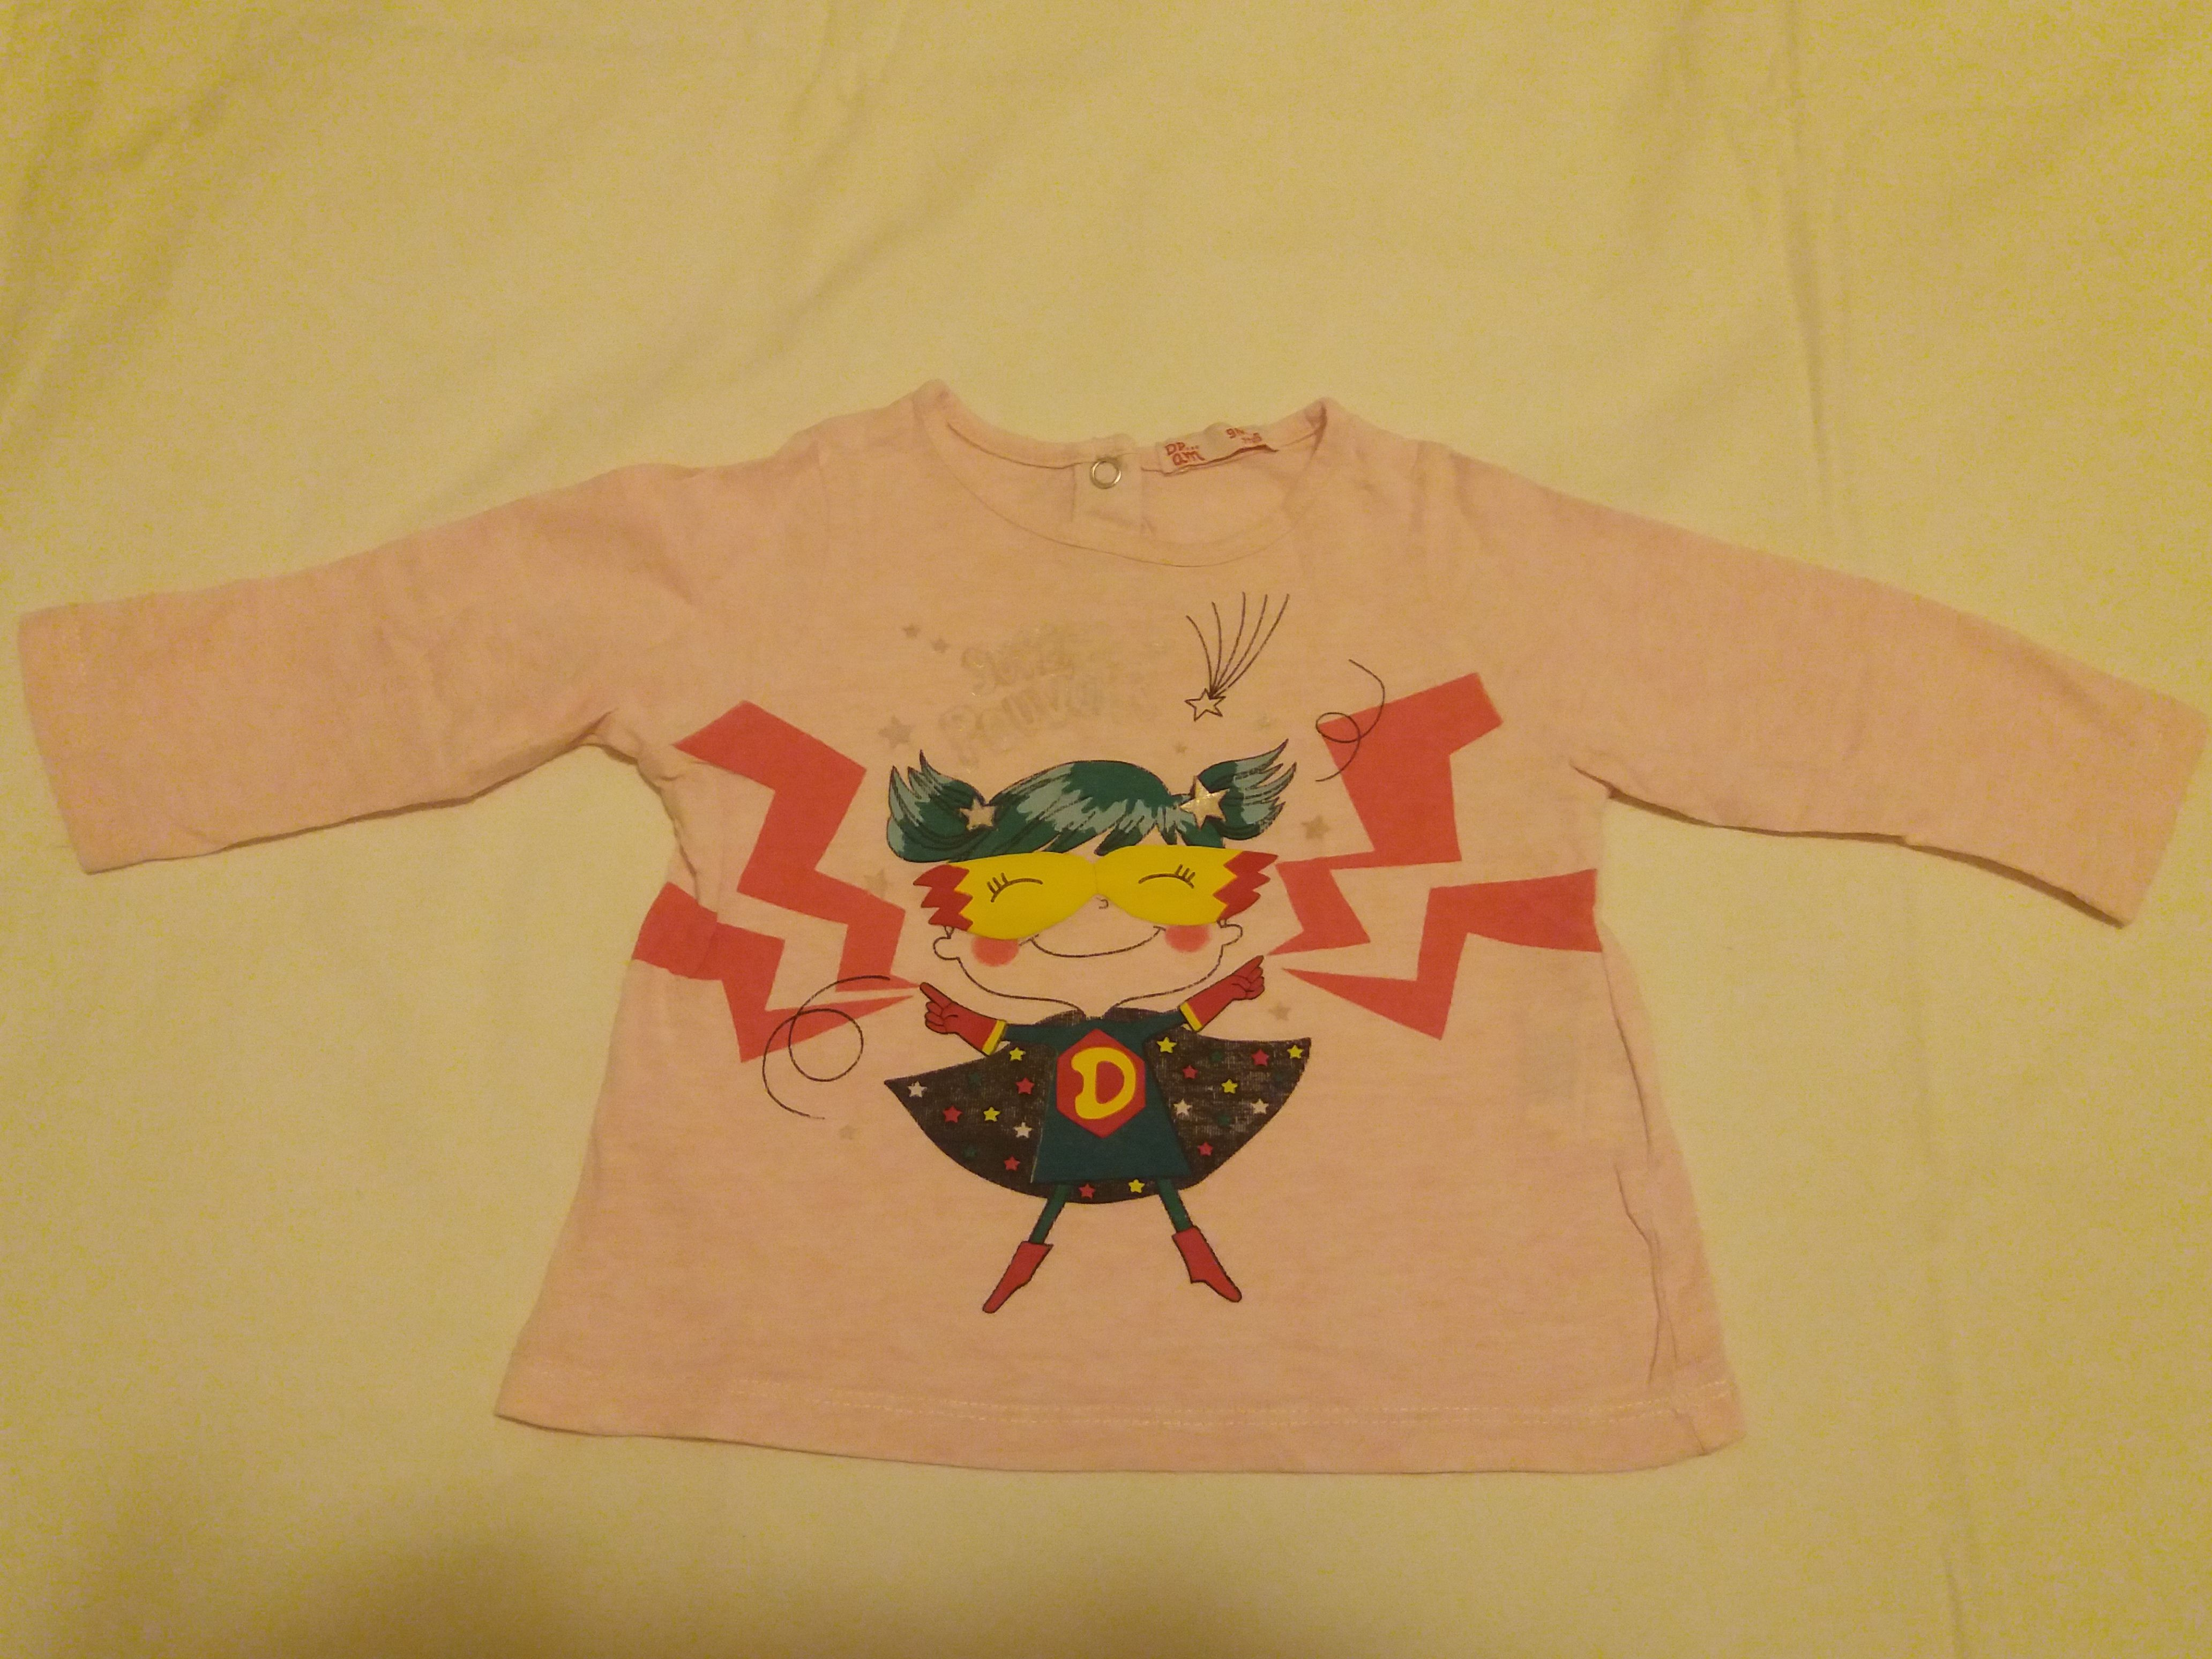 ae470047778 ρούχα για κορίτσι 0-18 μηνών και παπούτσια(Θεσσαλονίκη) - Πουλάω ...